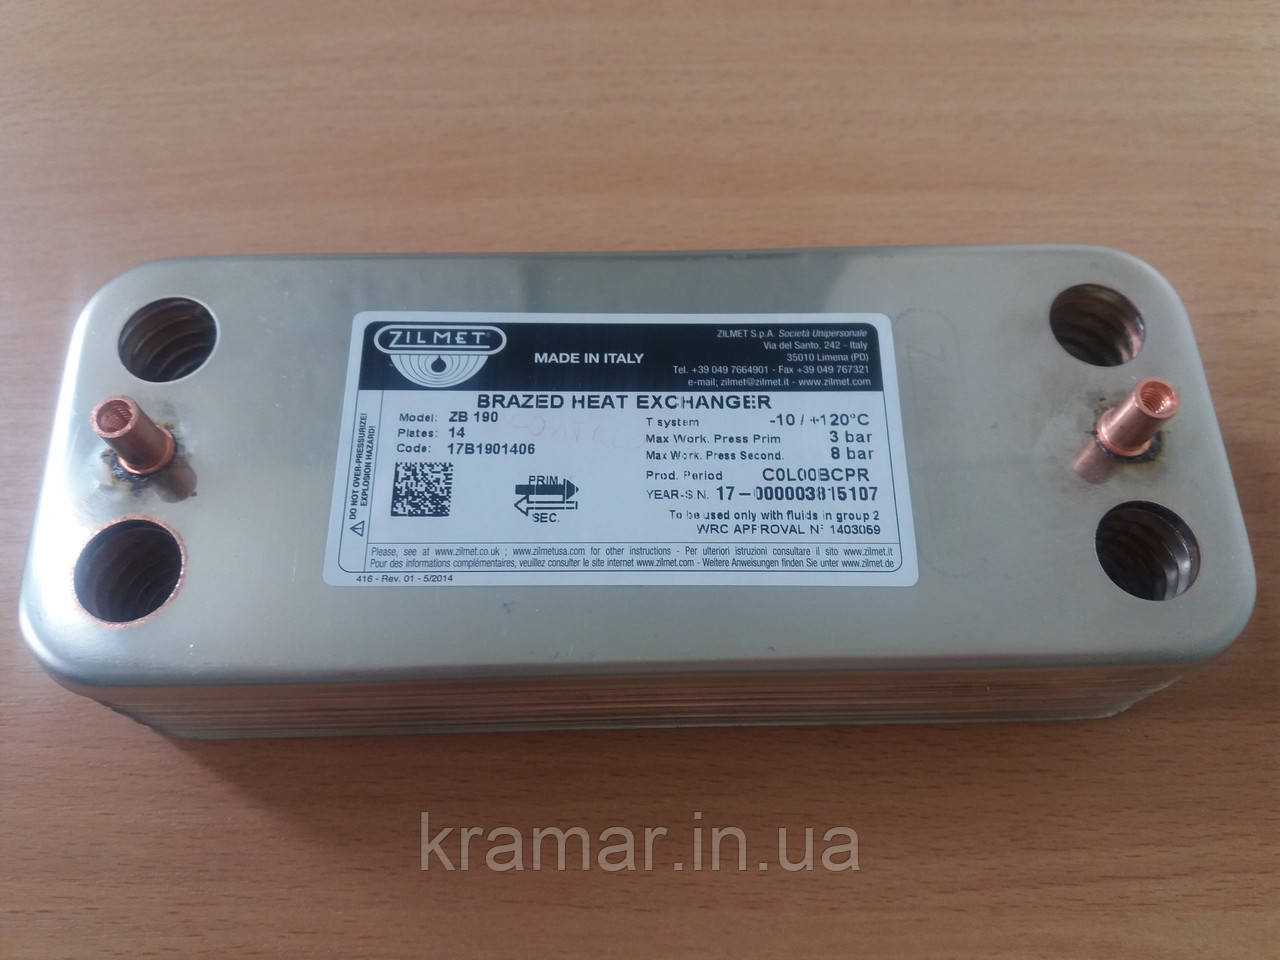 Теплообменник ГВС JUNKERS-BOSCH EUROLINE ZW/ОW 23 - AE/KE - 14 пластин